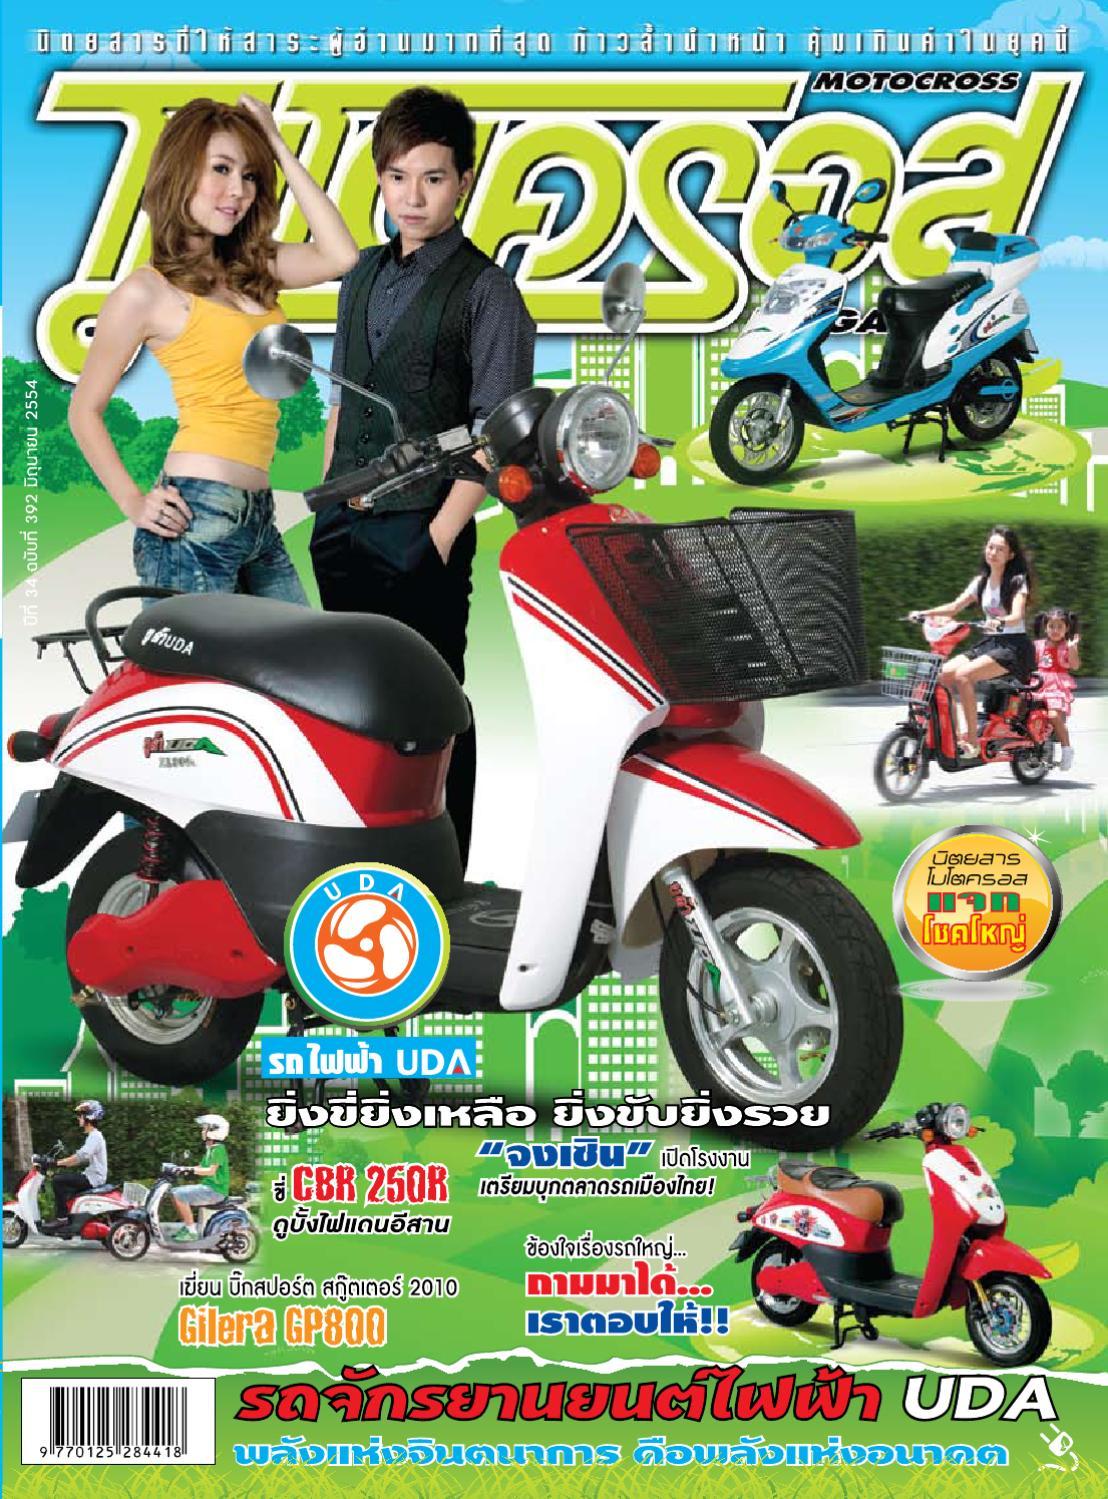 Motocross 392 June By Moto Mx Issuu